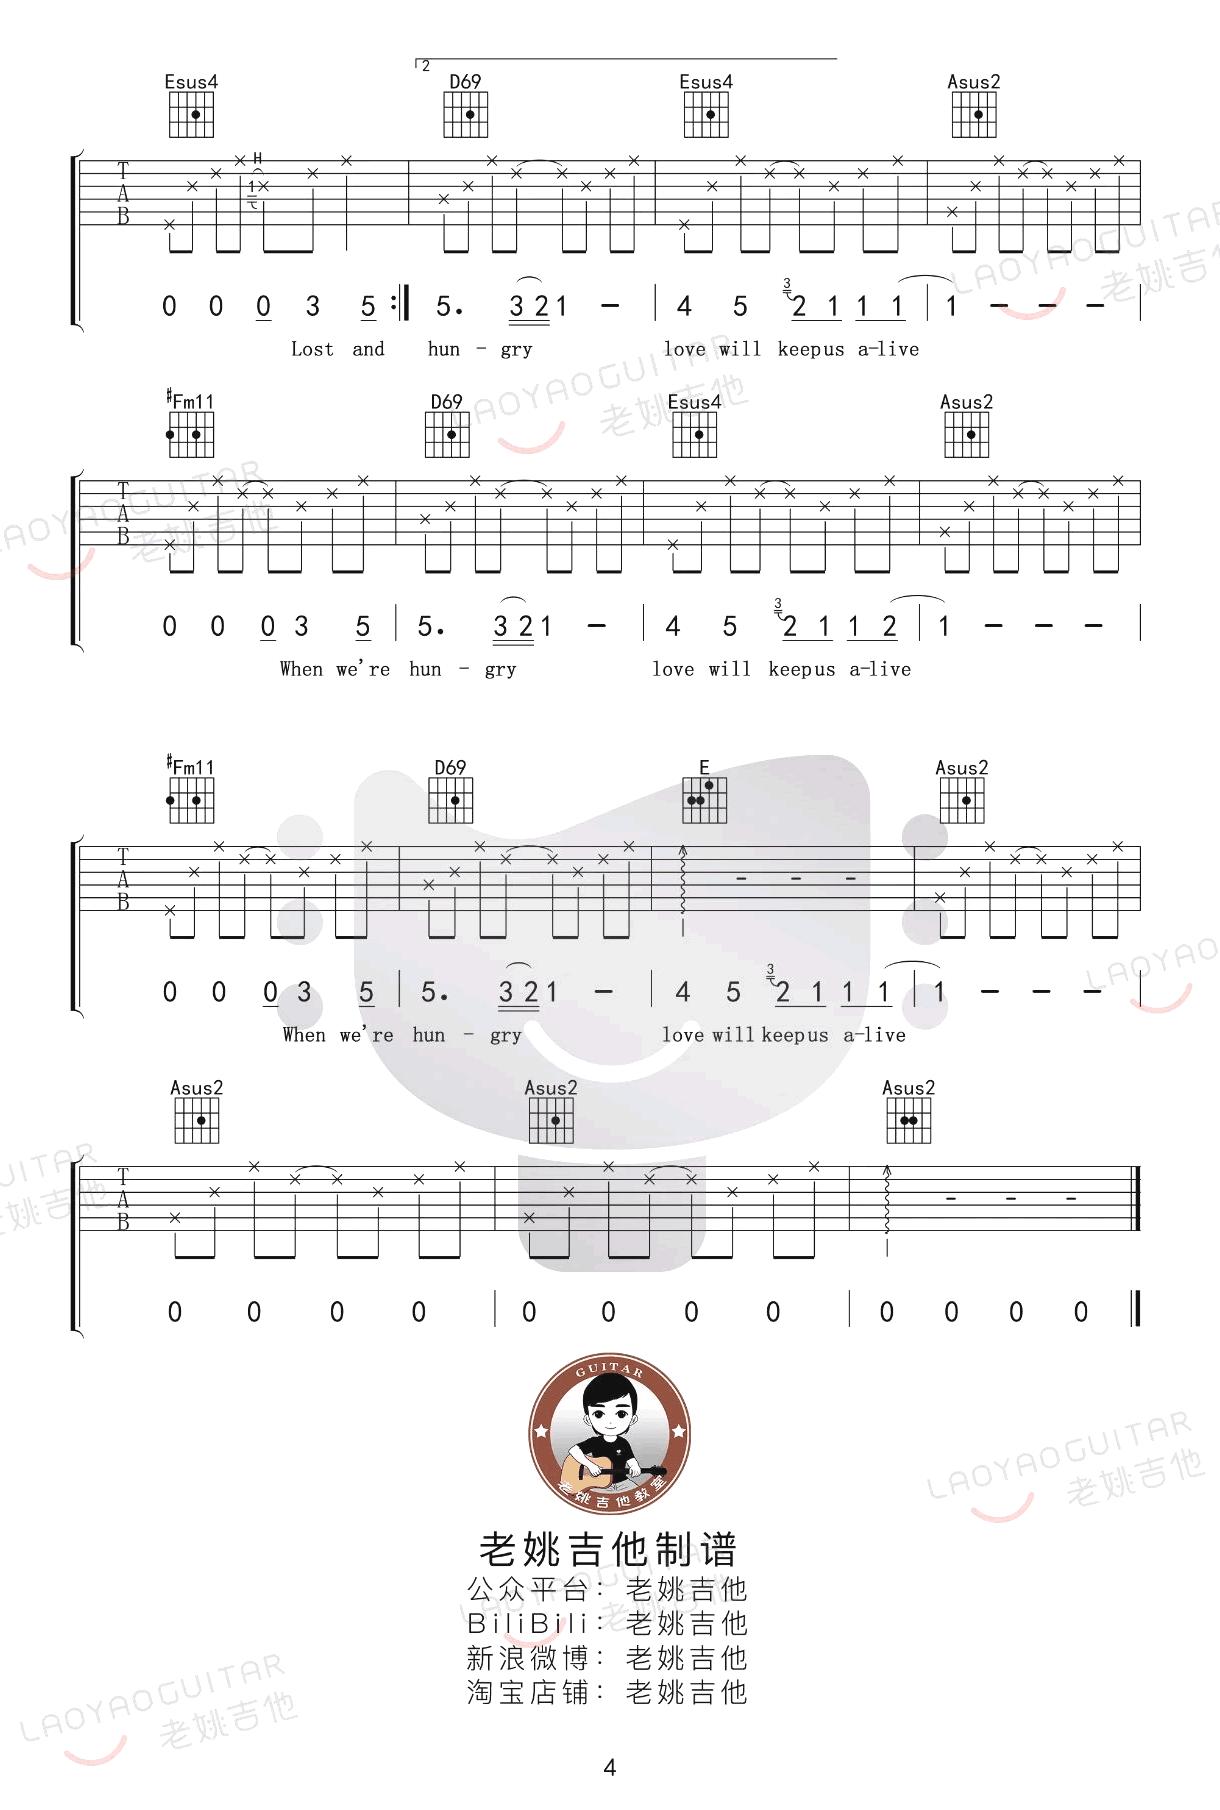 love will keep us alive吉他谱-老鹰乐队-4